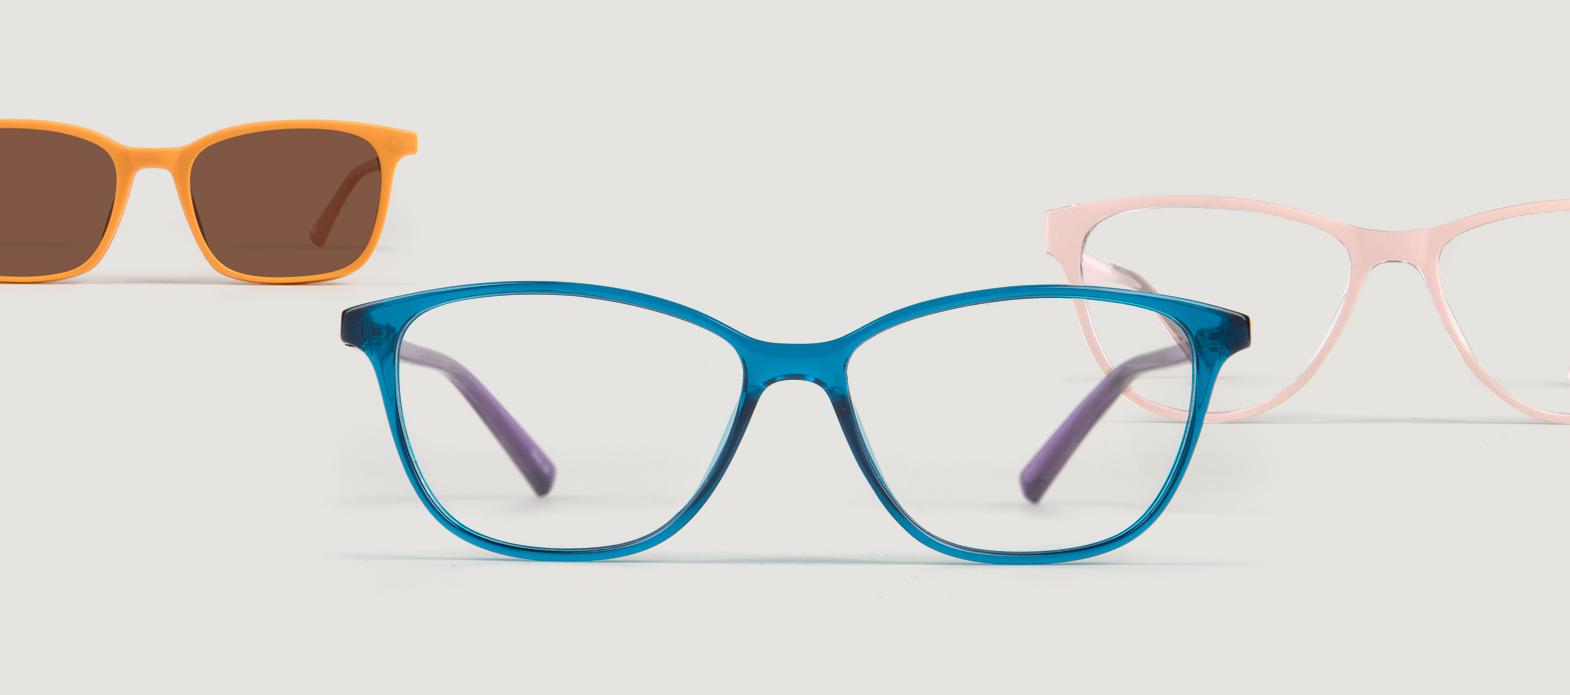 824b751eb2 Gafas Graduadas de Moda | Multiópticas - MULTIÓPTICAS